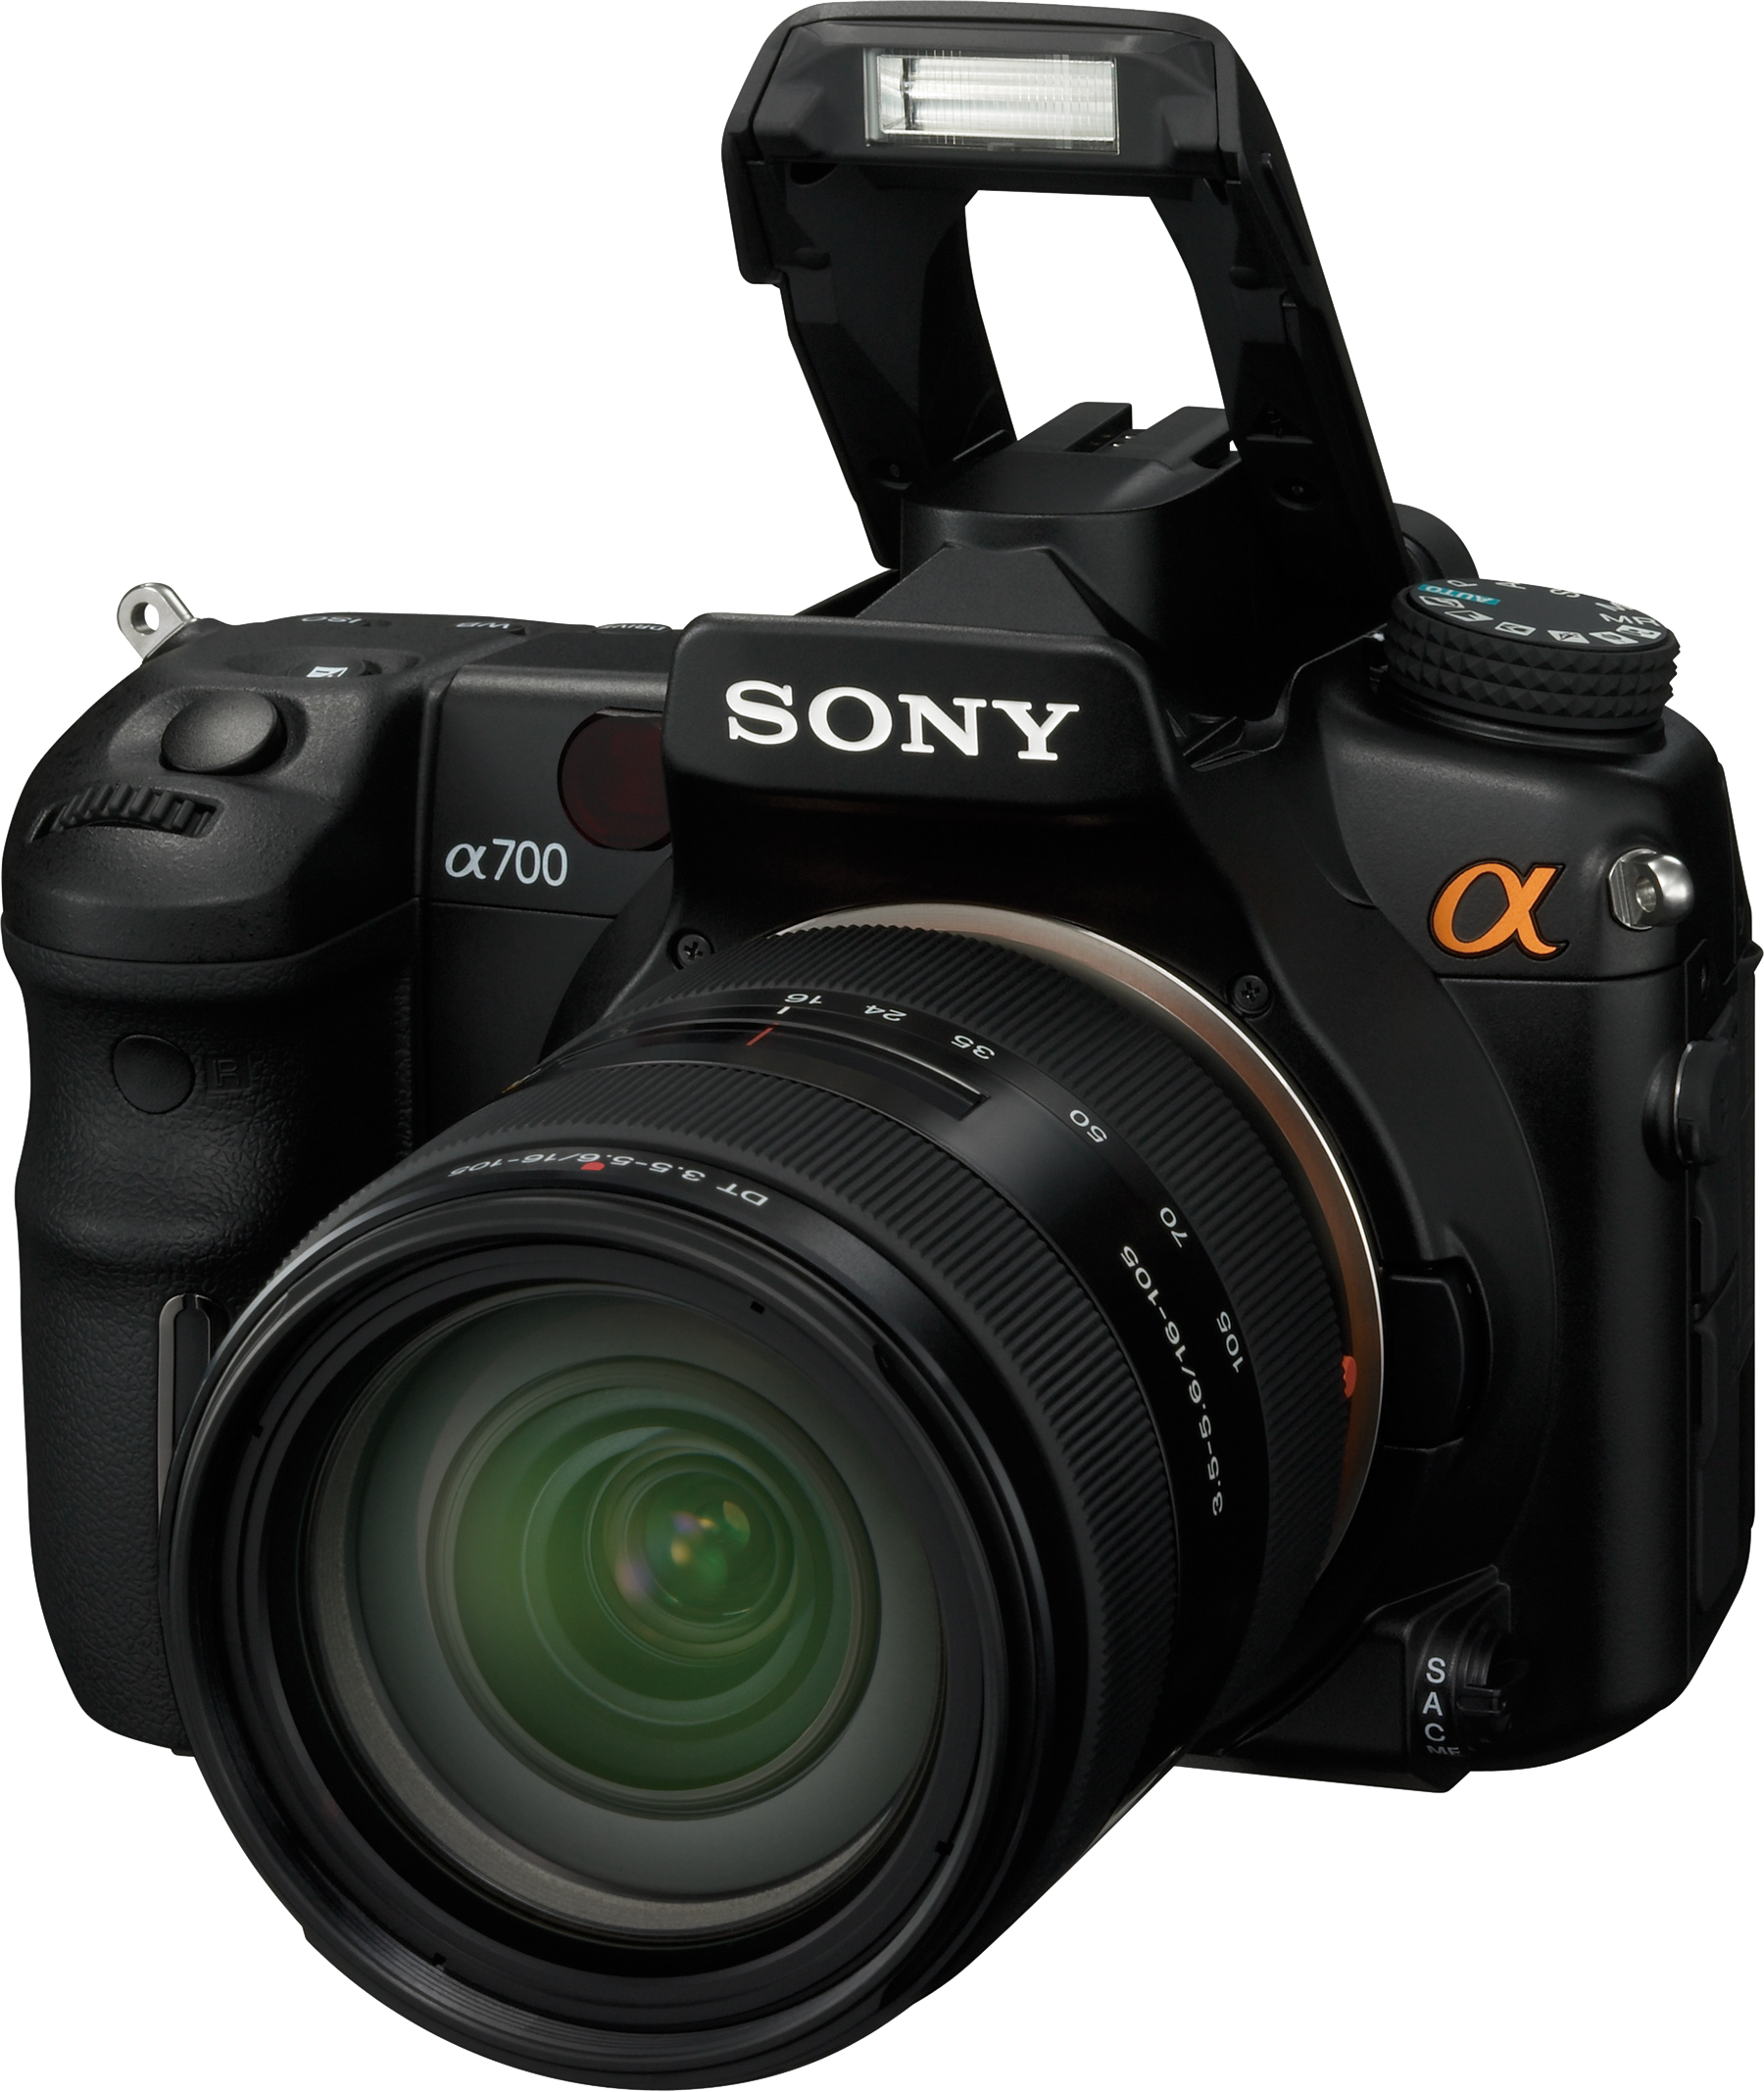 Canon 80d clipart clip art library download Canon EOS 80D Canon EOS 450D Canon EOS 650D Canon EOS 700D Sony ... clip art library download